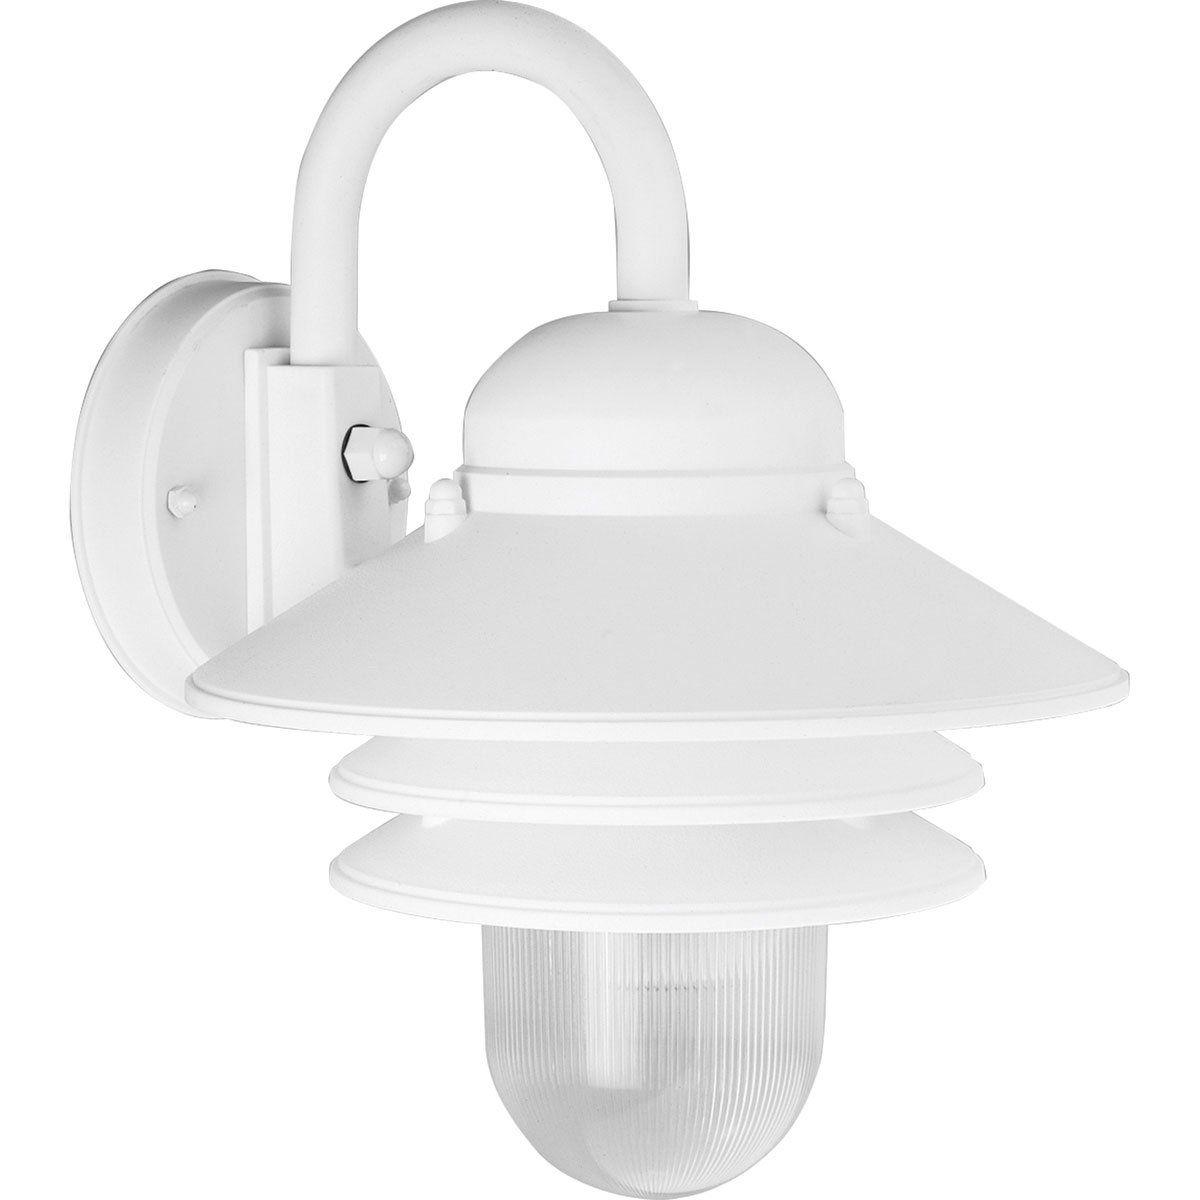 Progress Lighting P5645 30 Single Light Plastic Outdoor Wall Lantern With Prismatic Acrylic Shade White Outdoor Wall Sconce Wall Lantern Progress Lighting